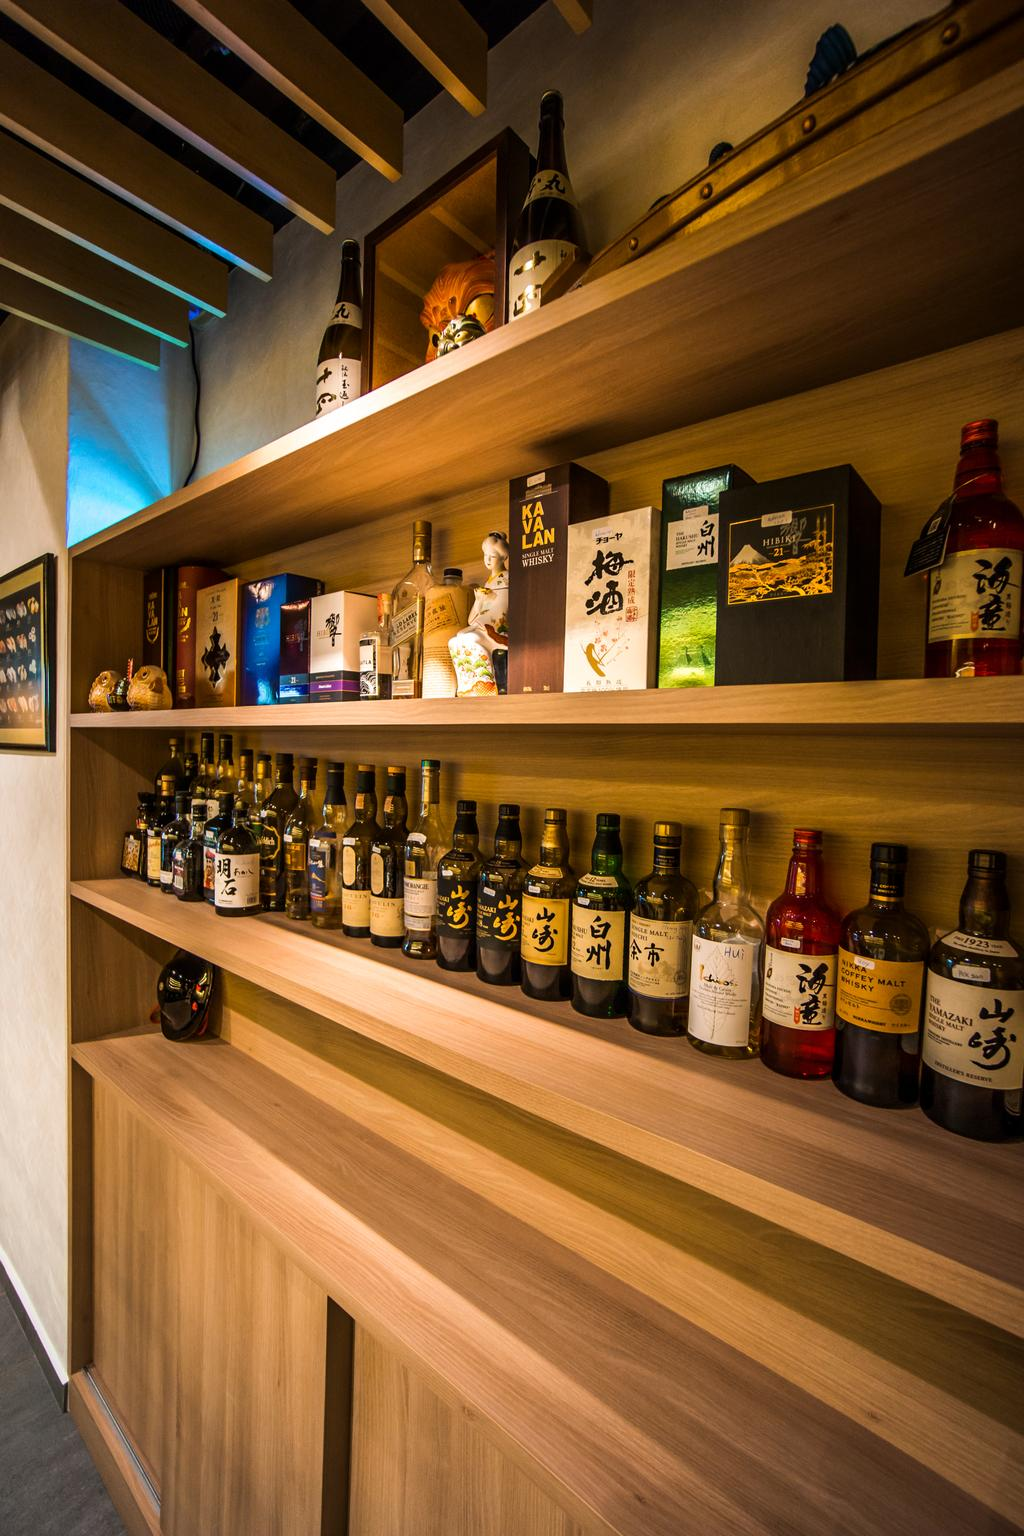 Hakumai, Commercial, Interior Designer, Flo Design, Contemporary, Alcohol, Beer, Beer Bottle, Beverage, Bottle, Drink